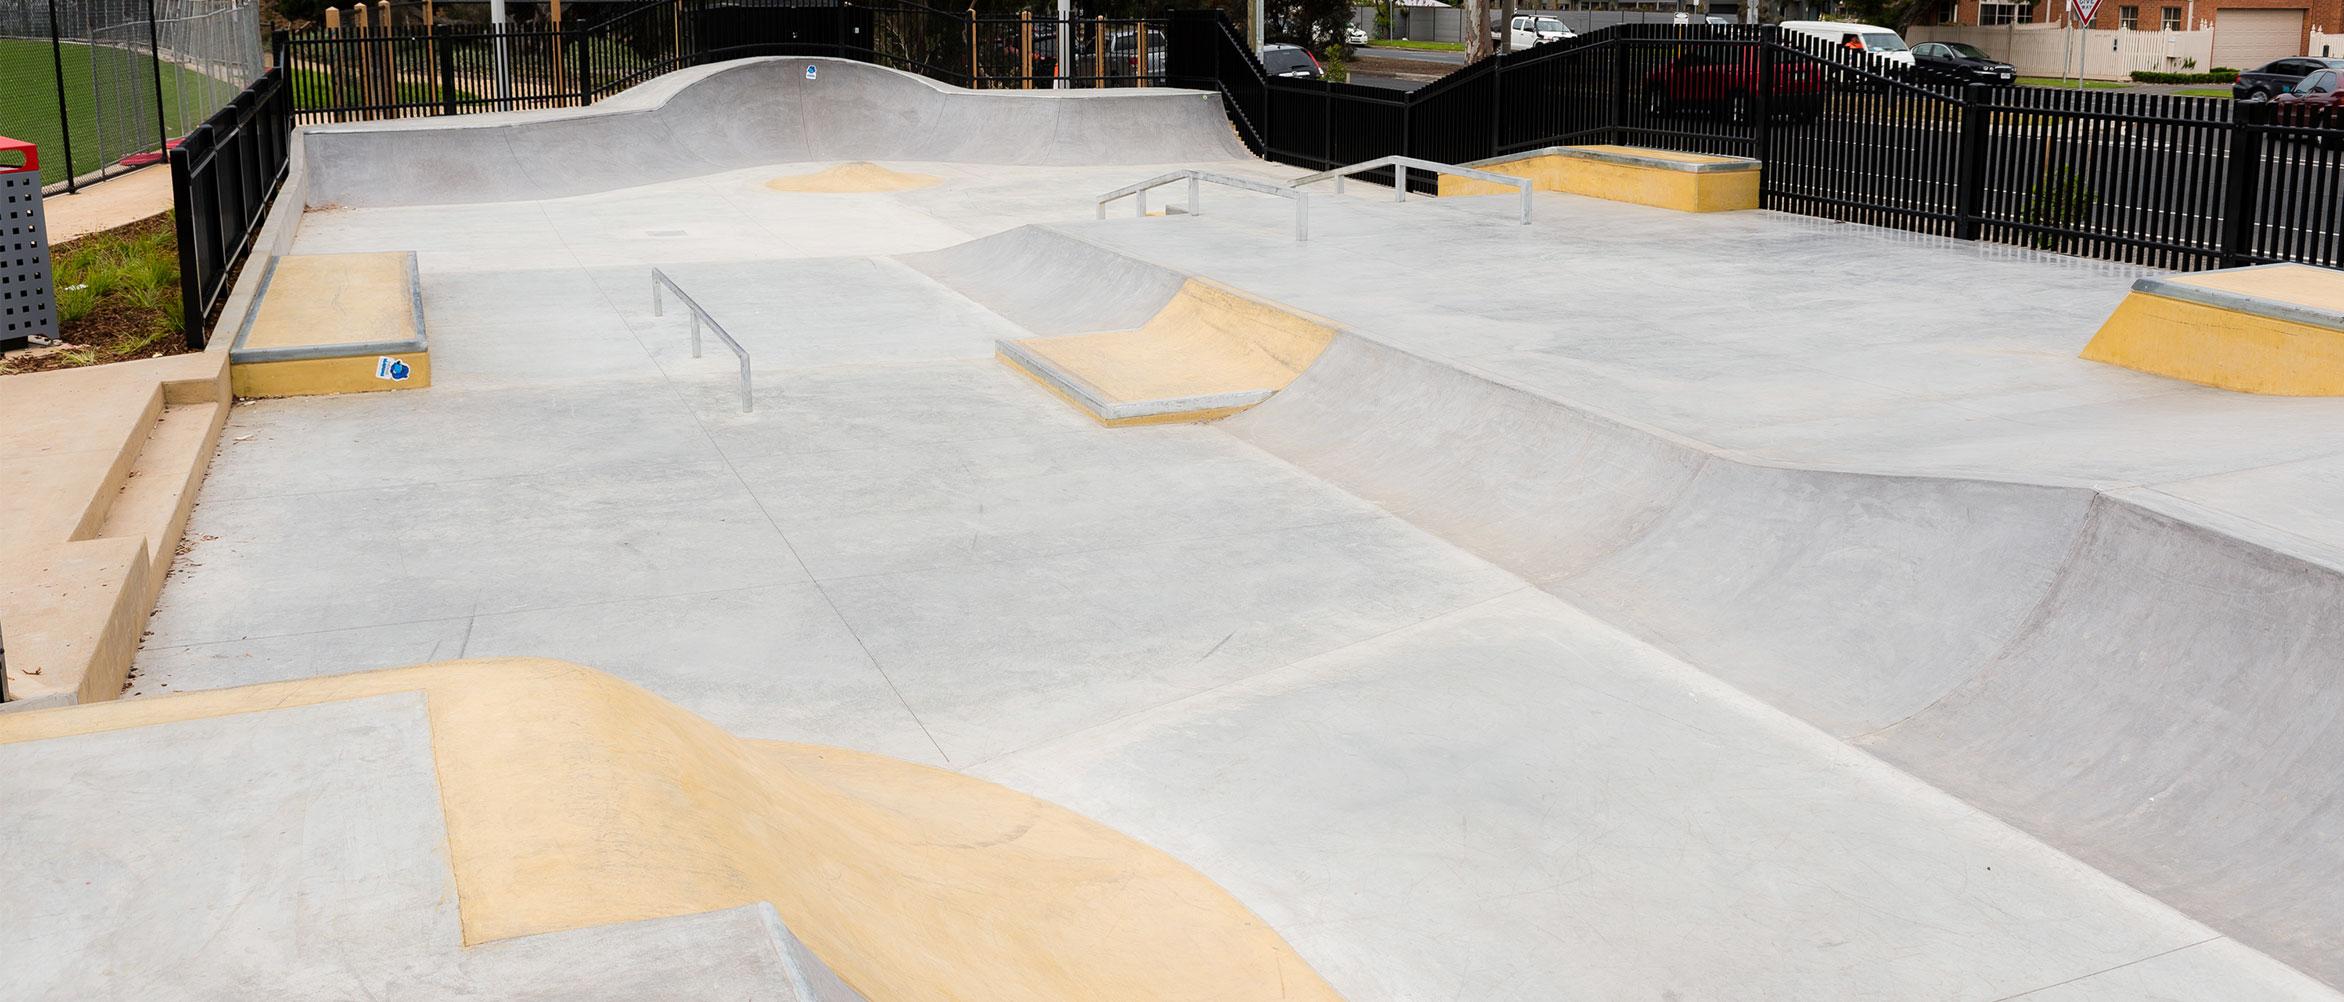 Bentleigh East skate park street section